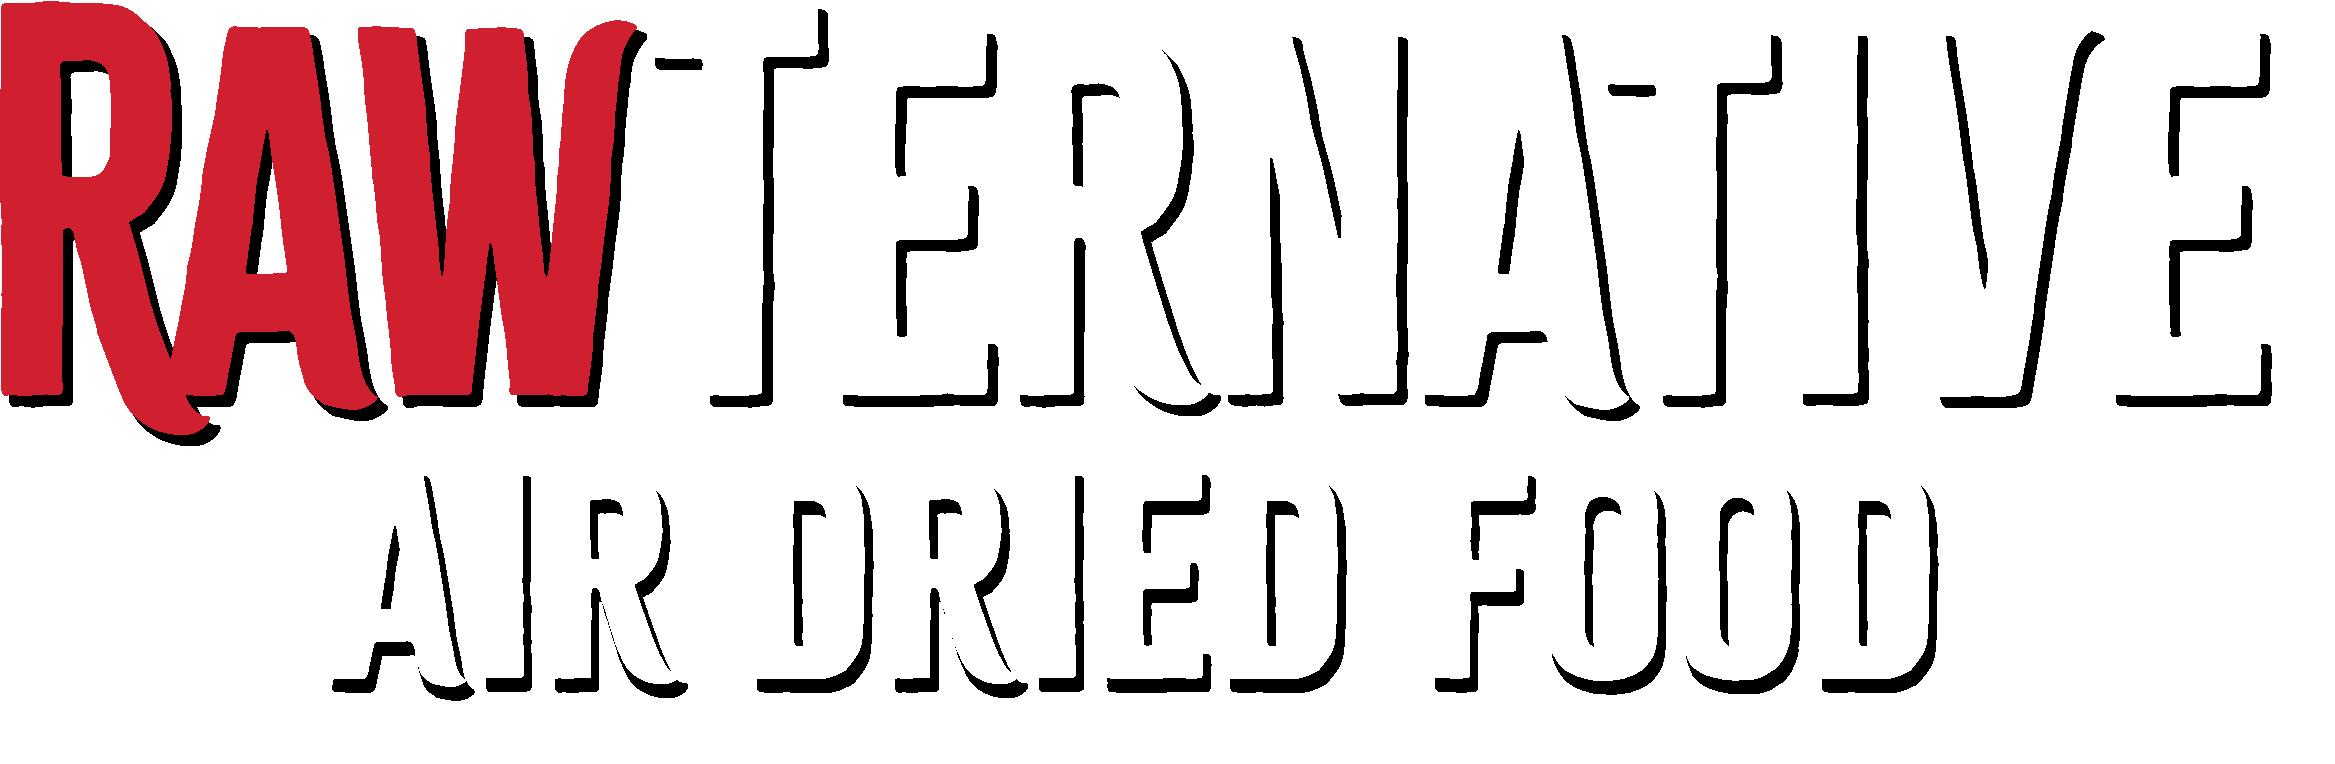 rawternative logo